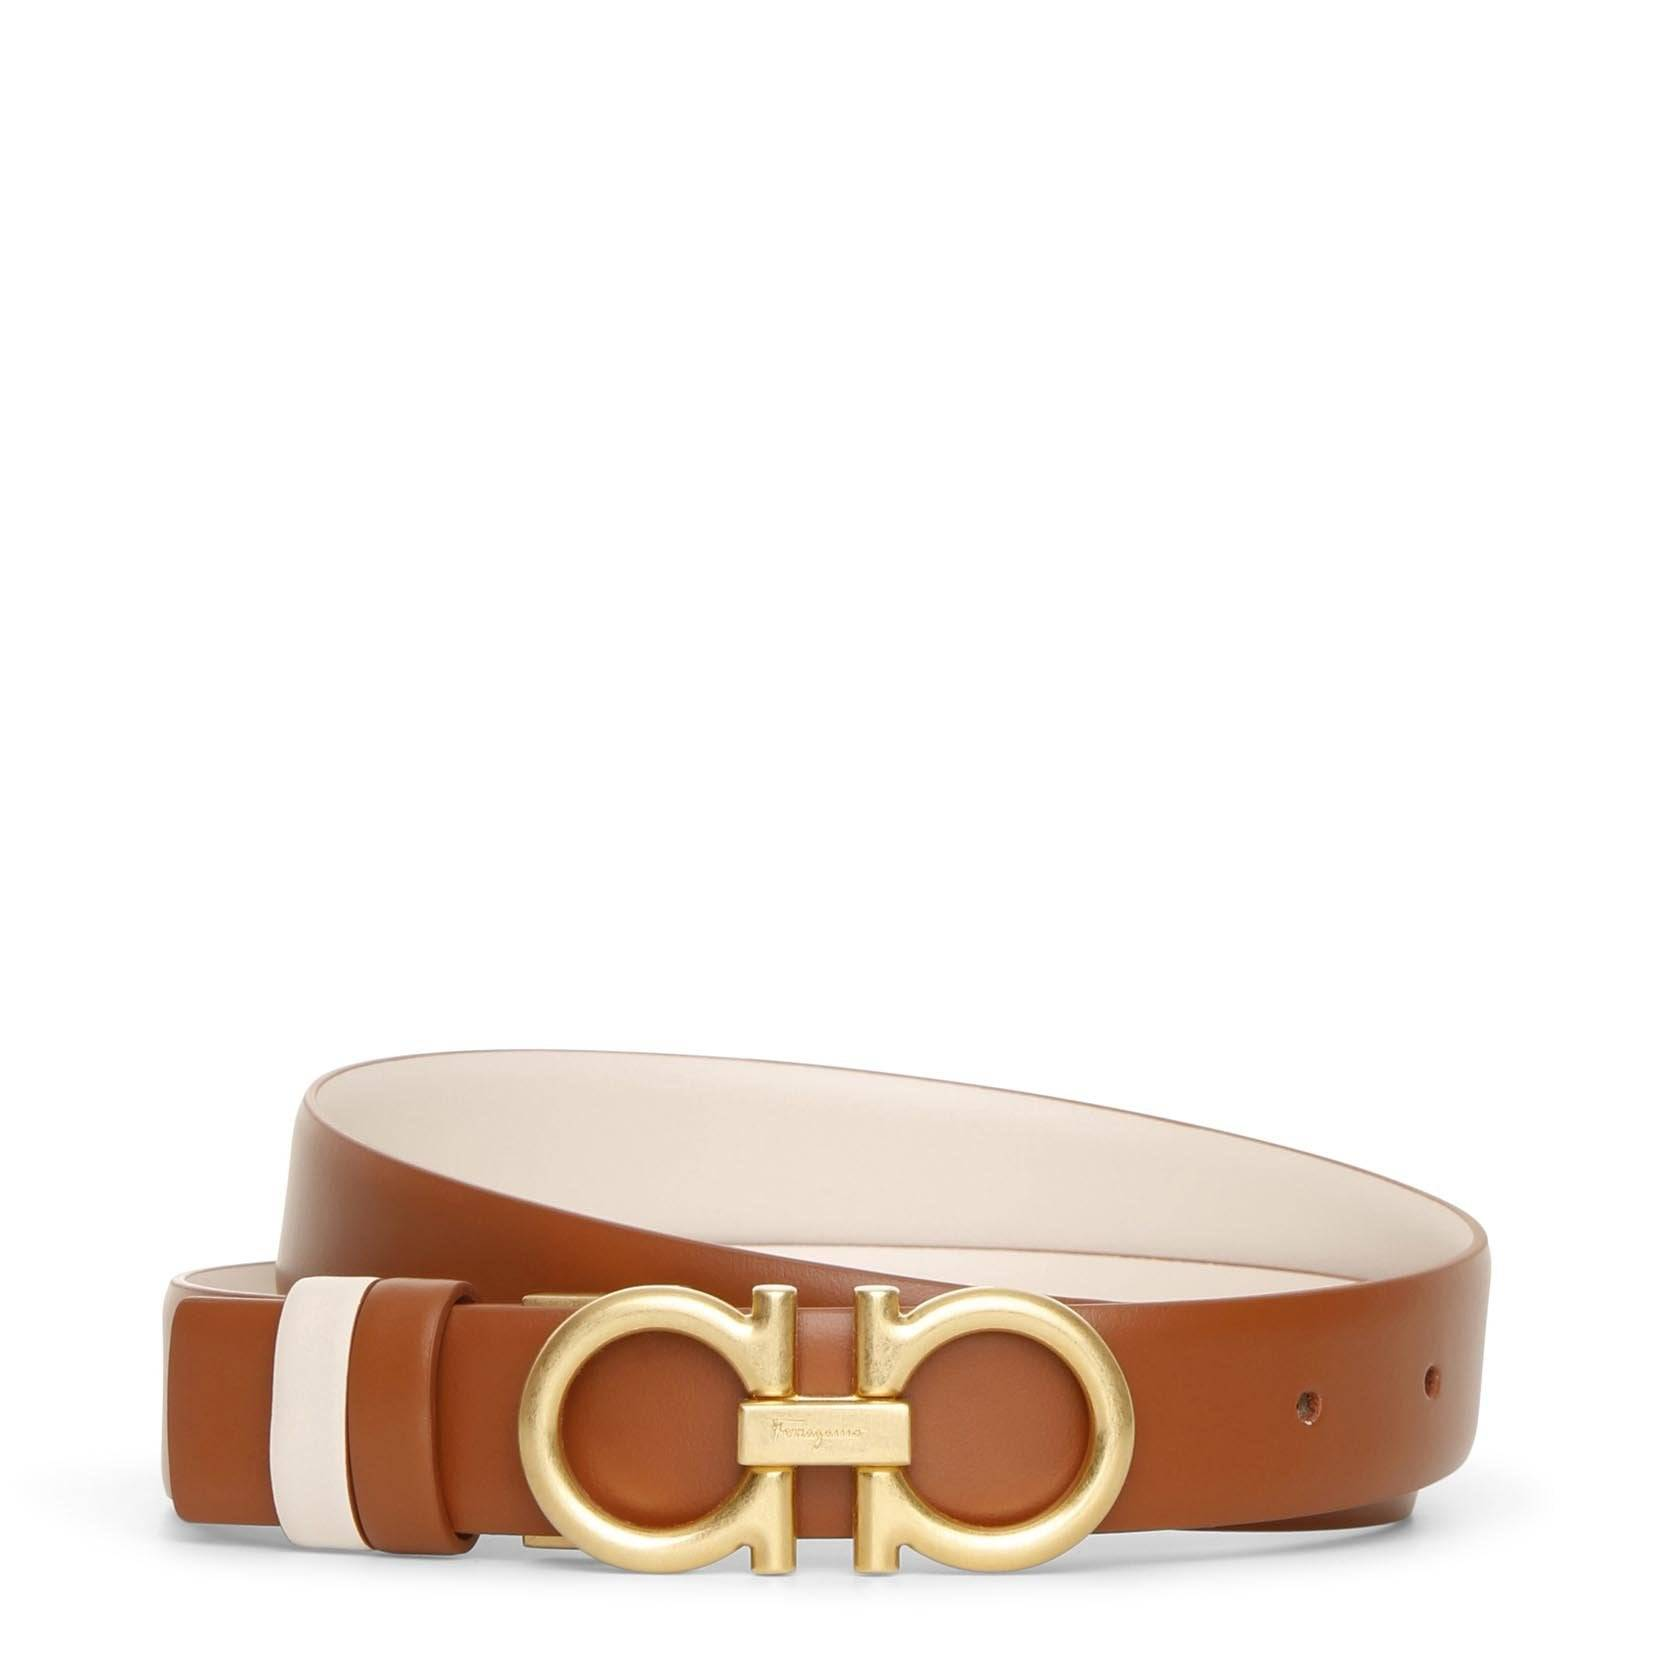 Salvatore Ferragamo Reversable and adjustable tan cream leather belt  - brown/beige - female - Size: 90